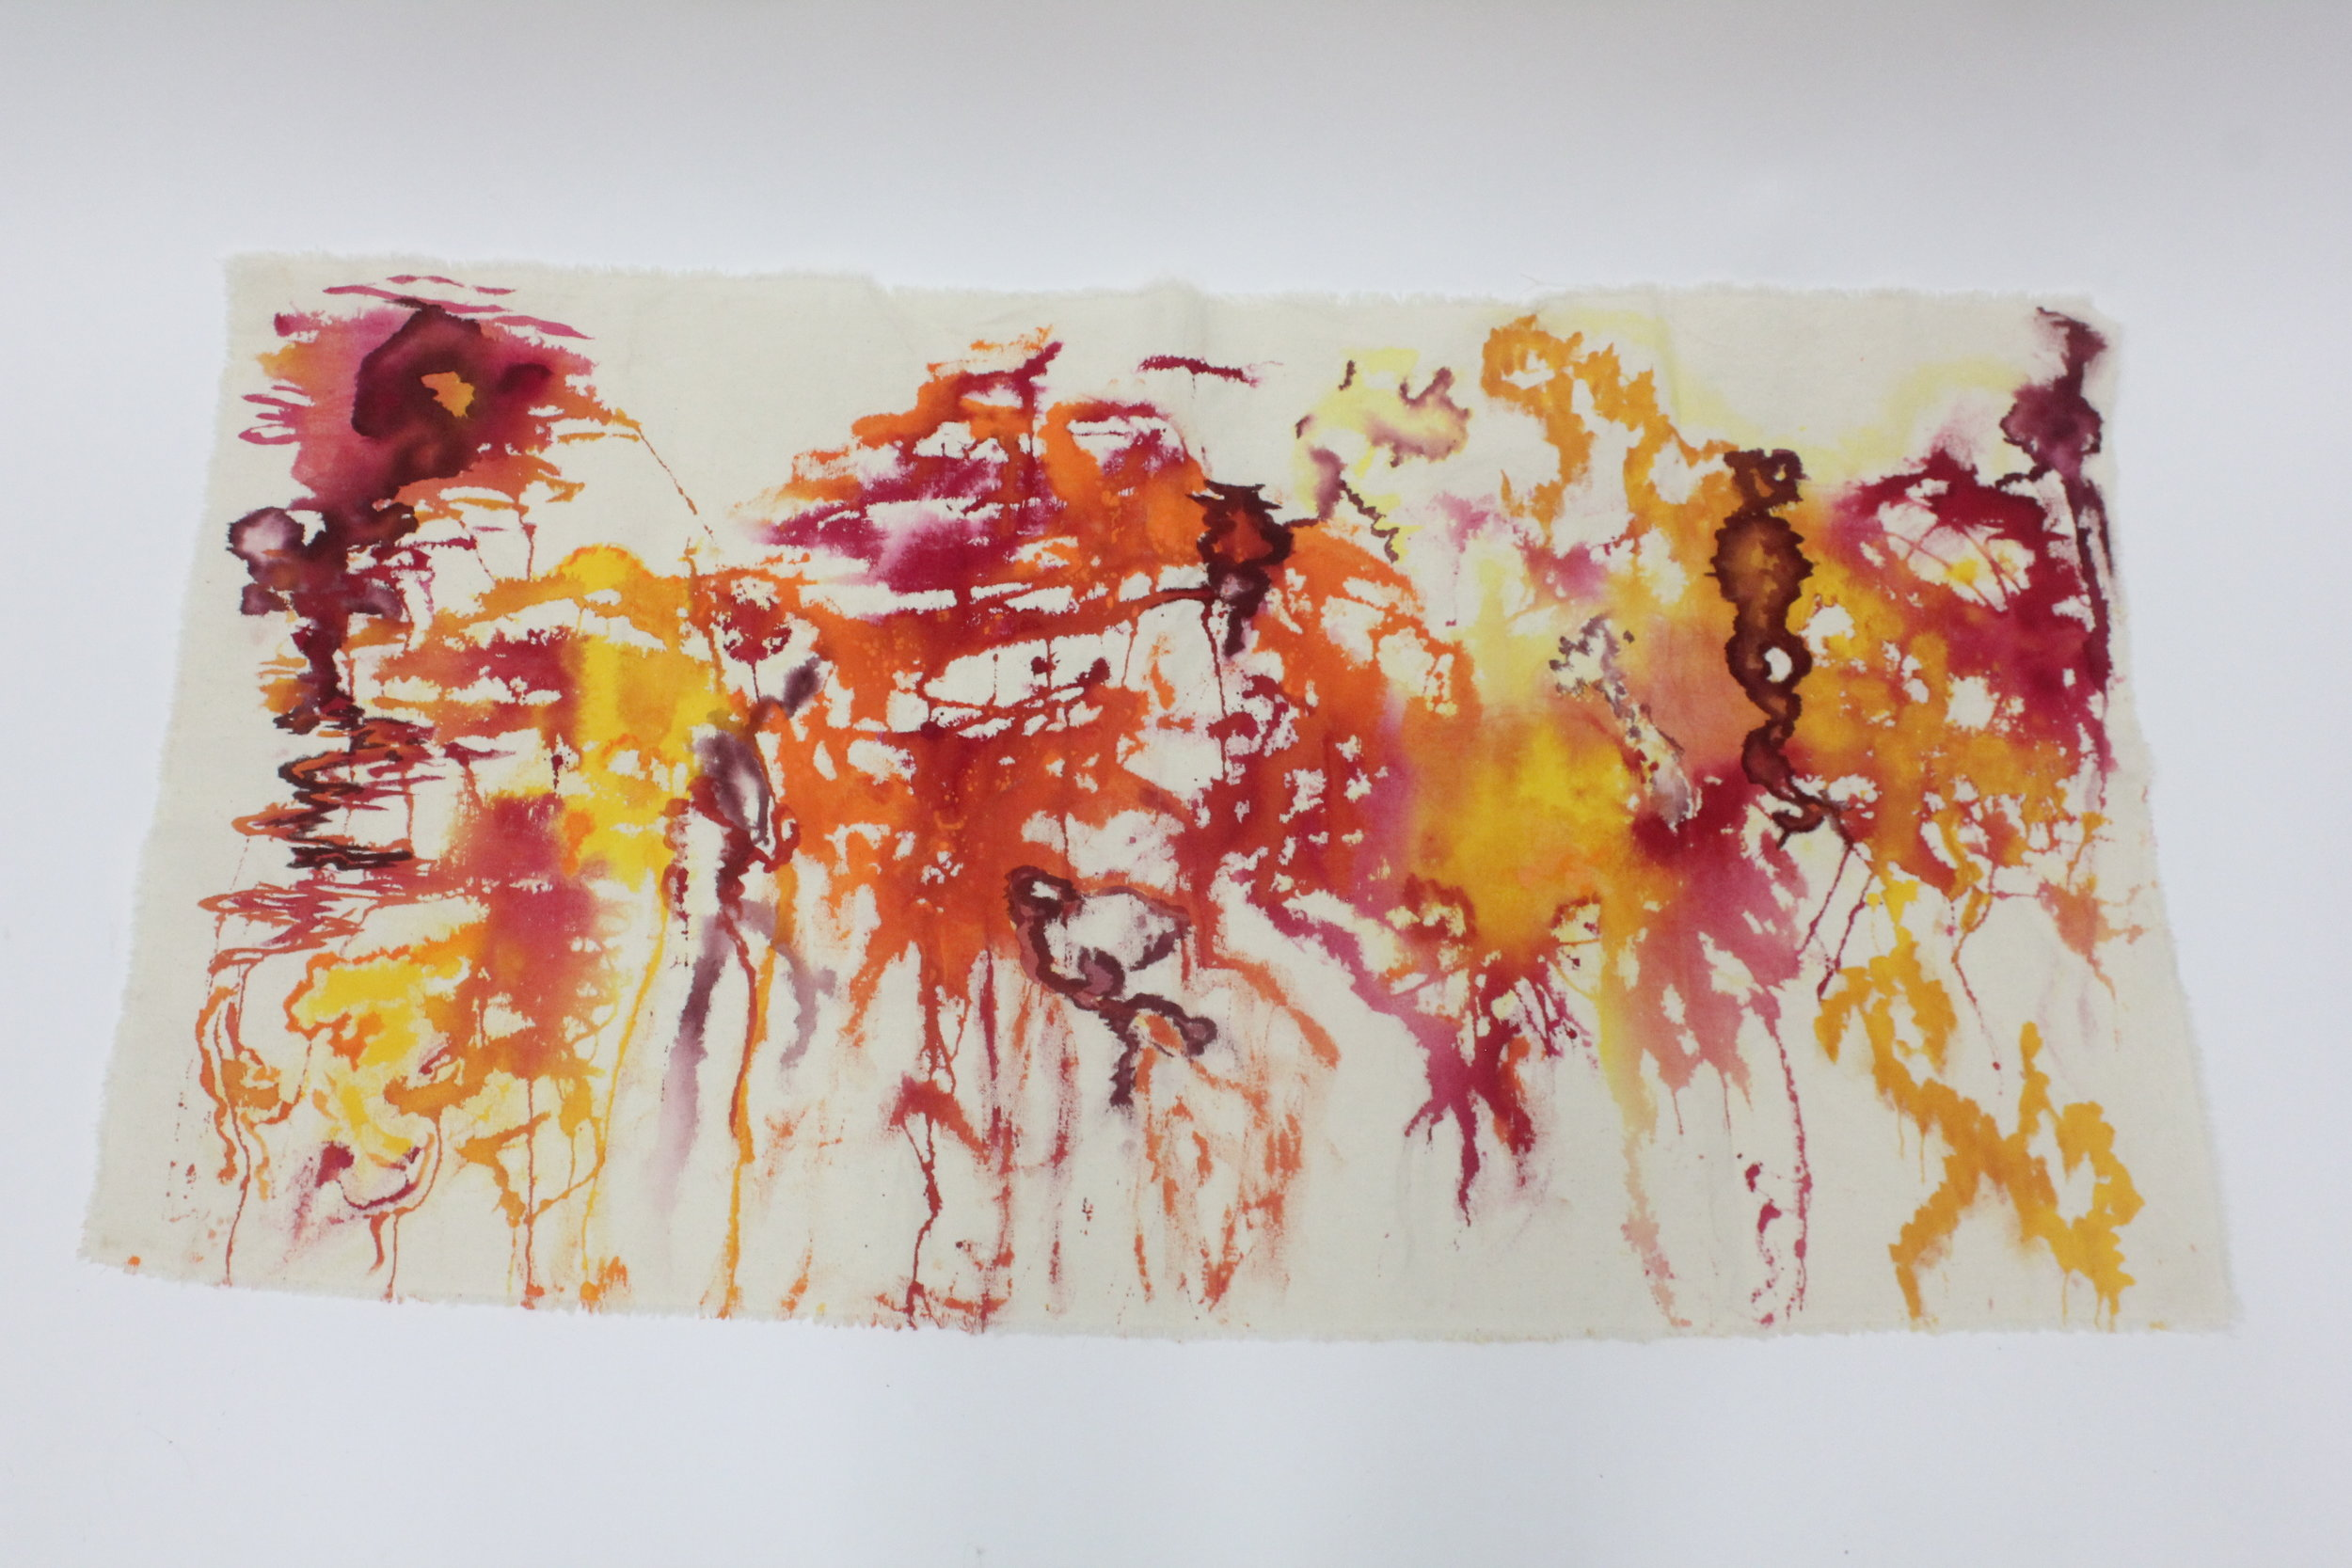 Paintings by Jackeline Alvarez